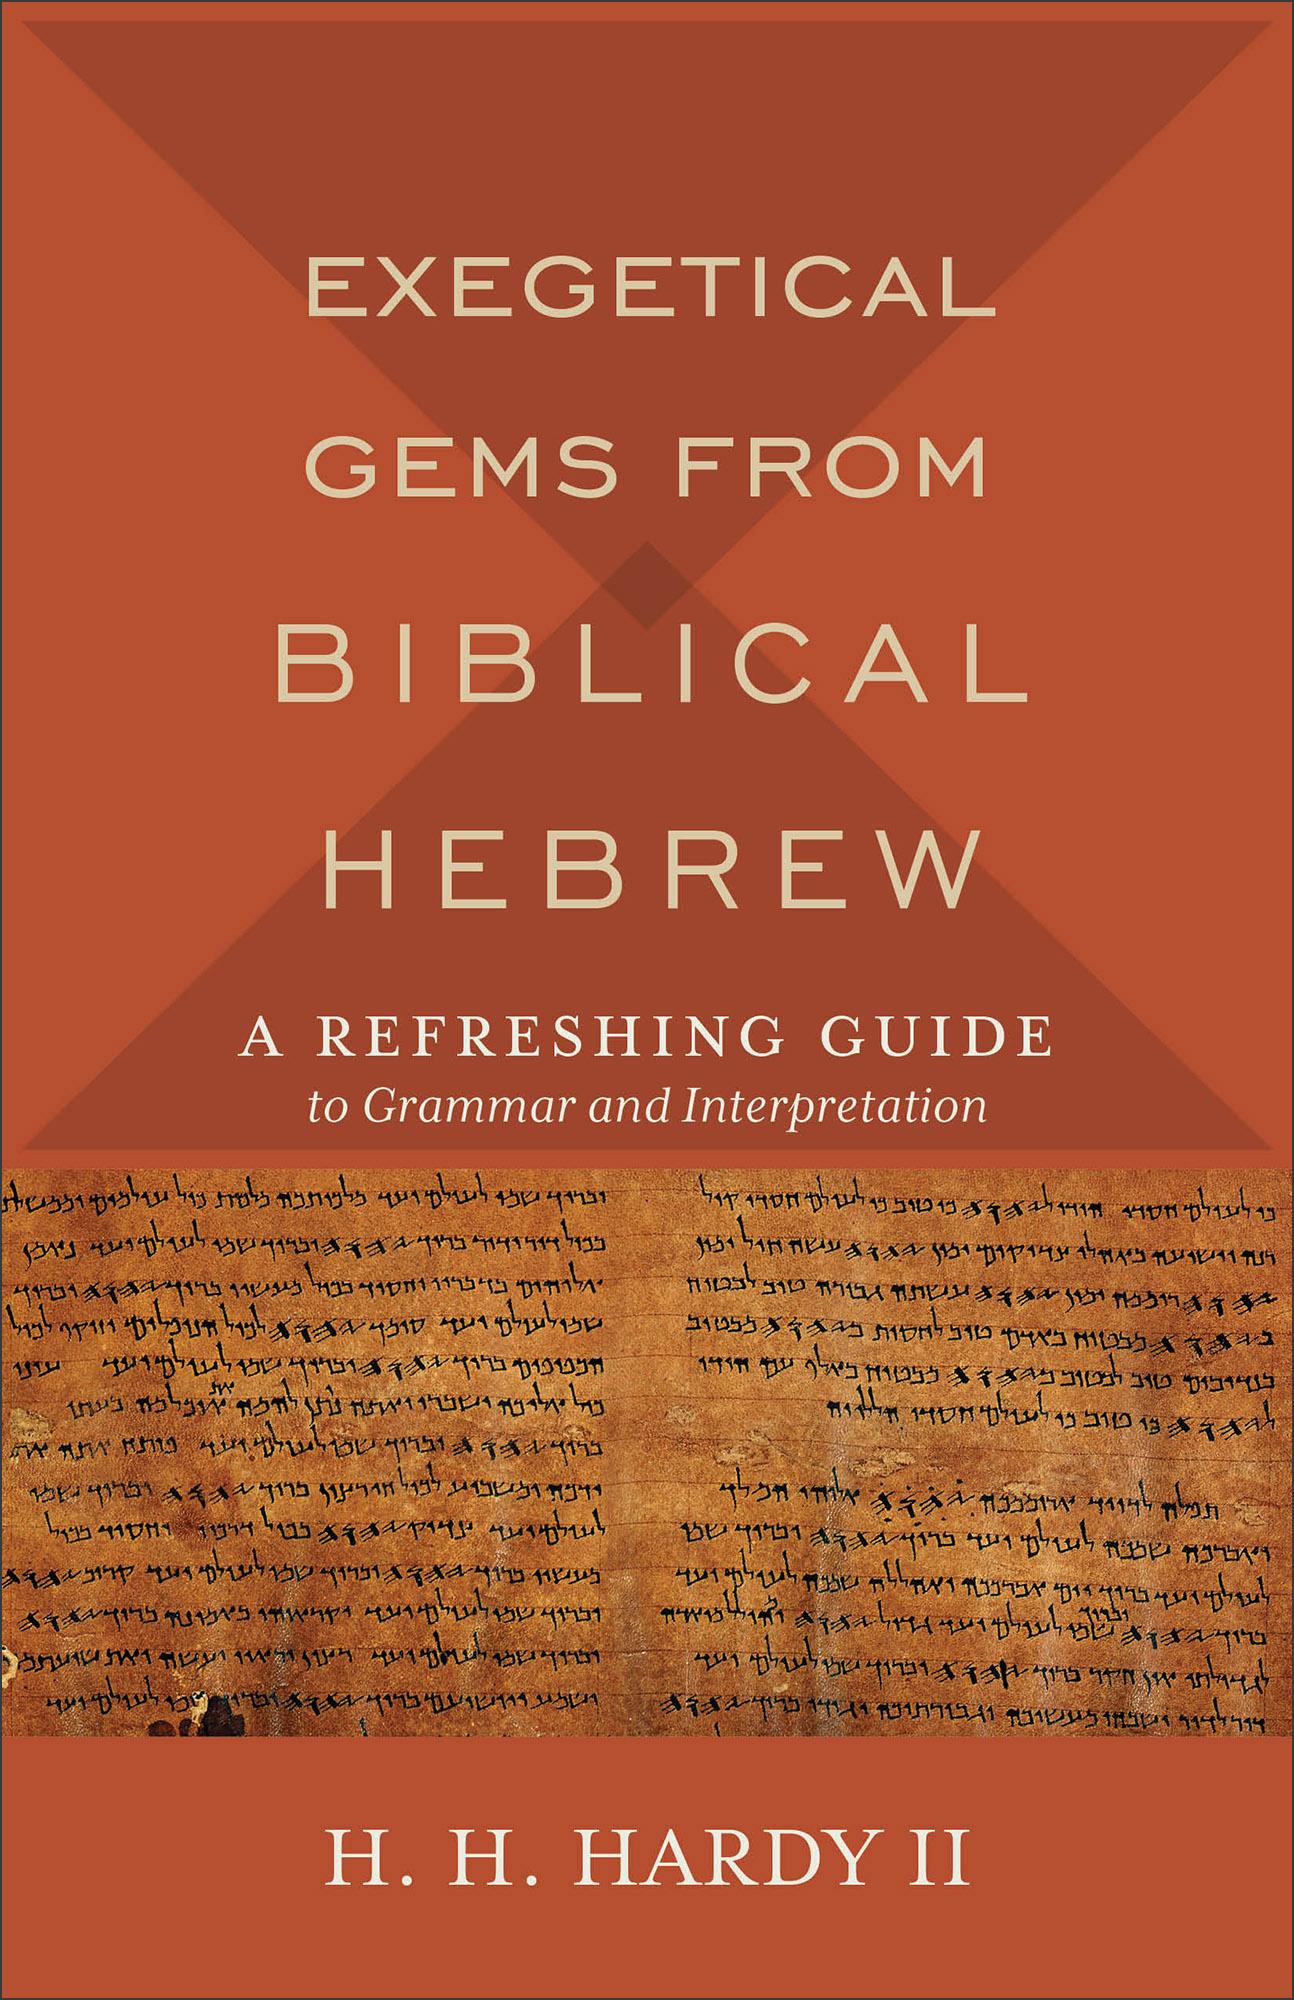 Exegetical Gems from Biblical Hebrew | Baker Publishing Group